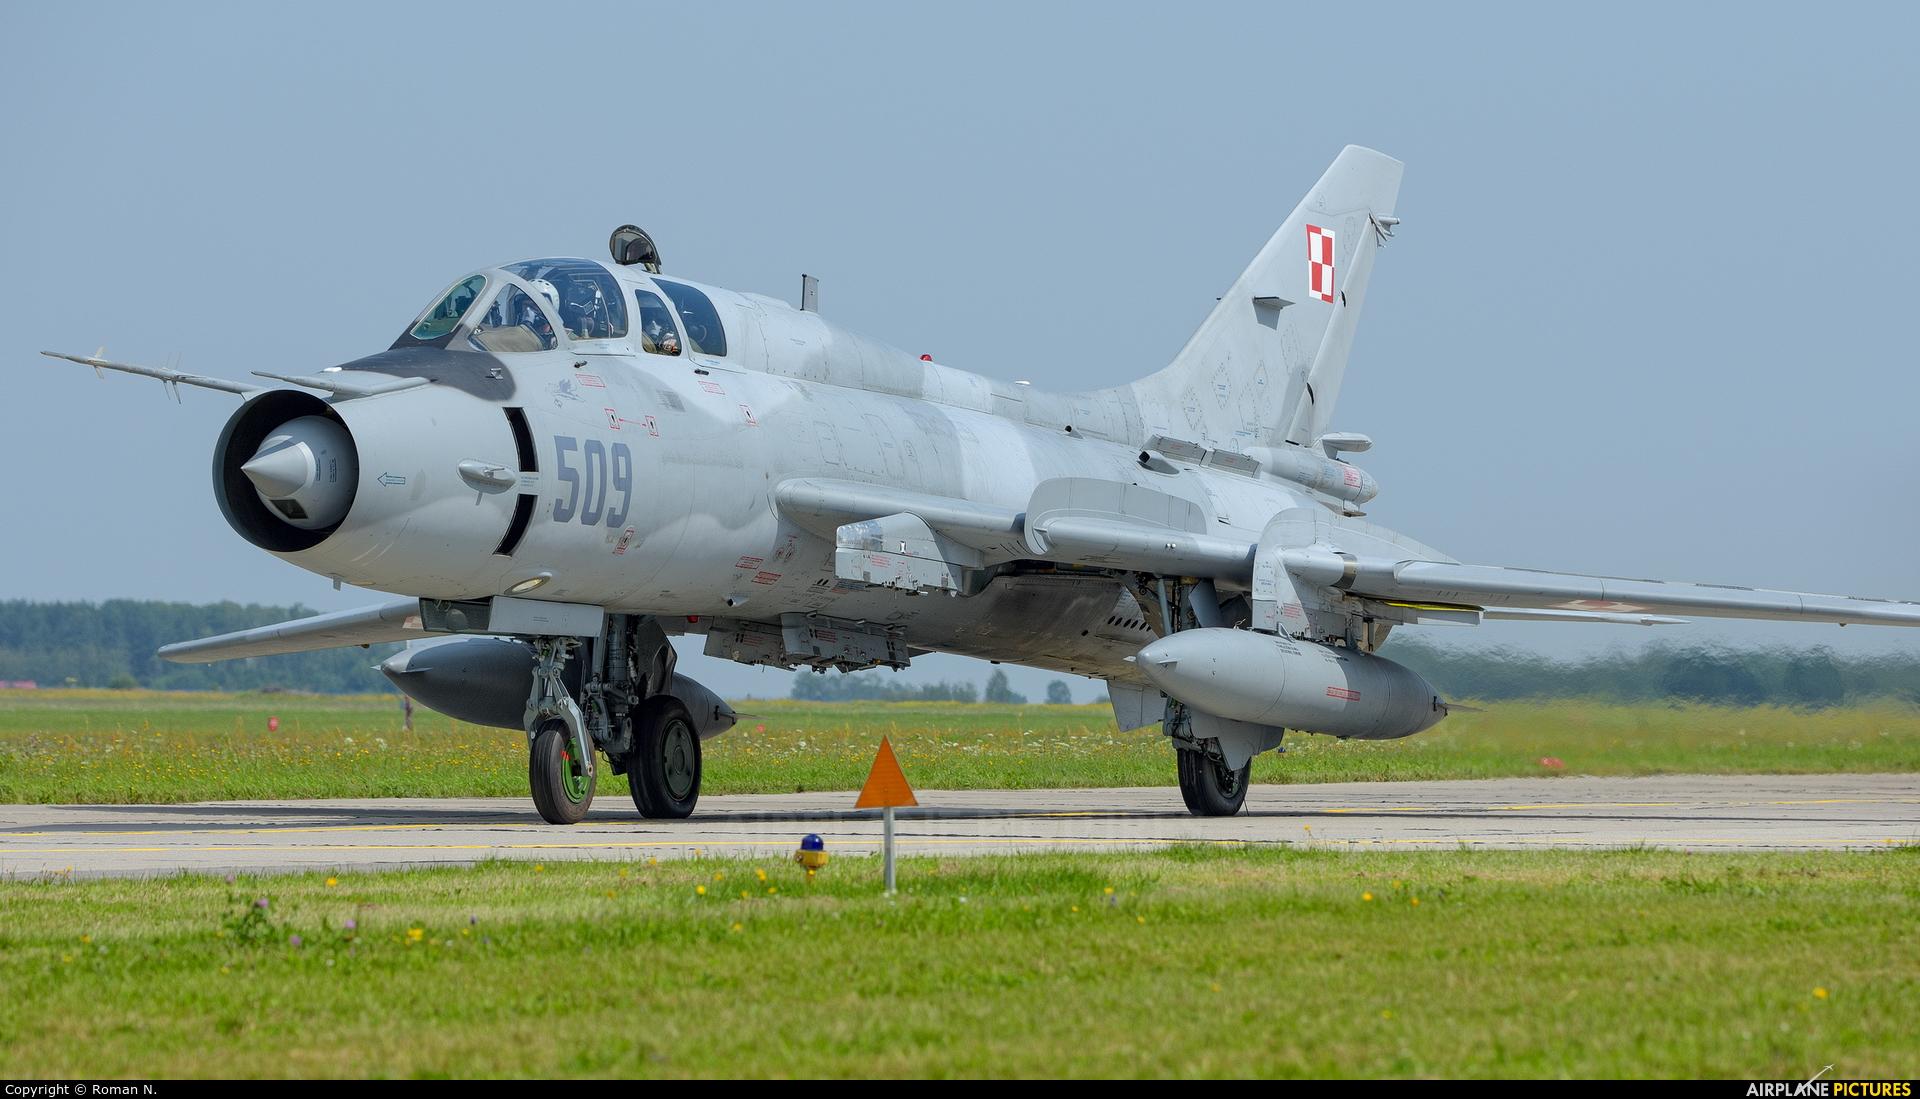 Poland - Air Force 509 aircraft at Mińsk Mazowiecki